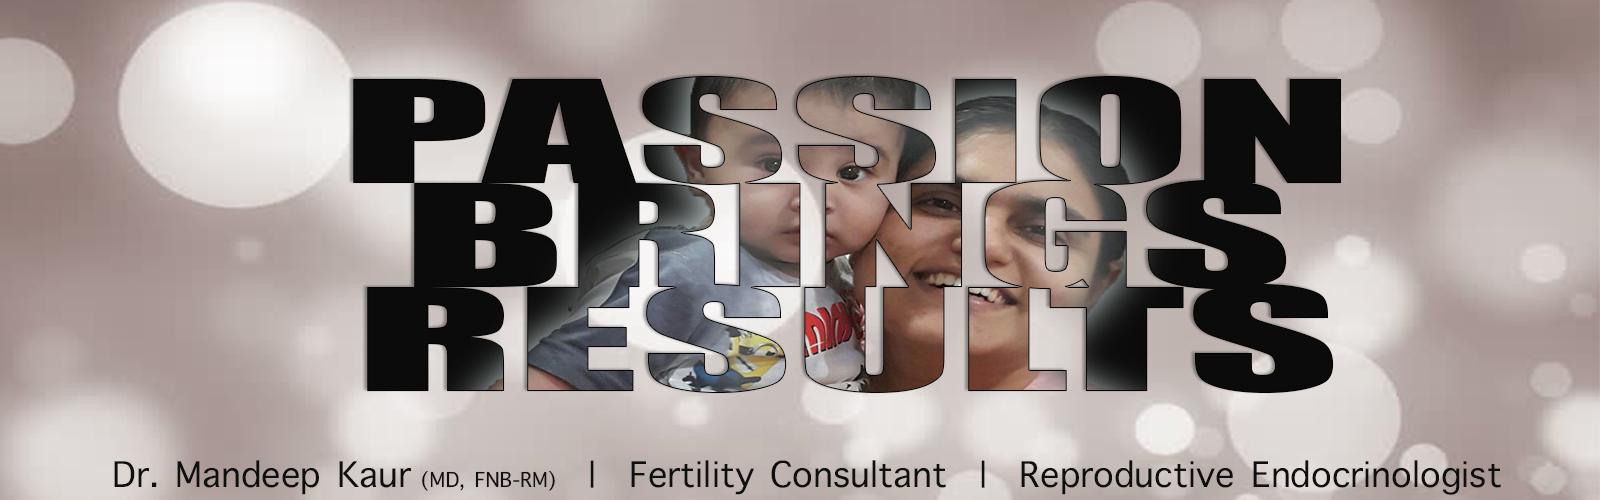 Dr. Mandeep Kaur Best infertility doctor jalandhar